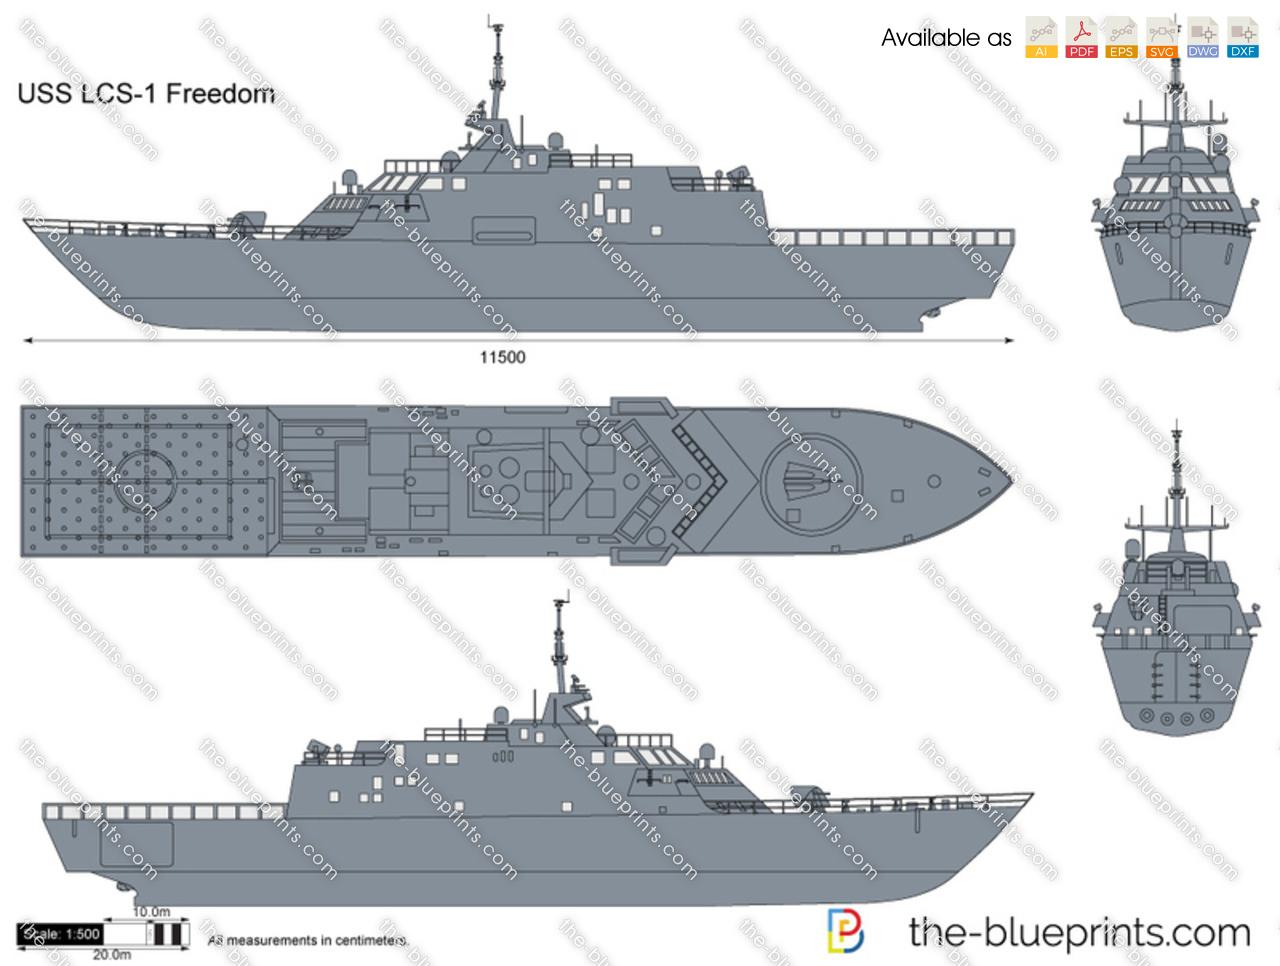 USS LCS-1 Freedom